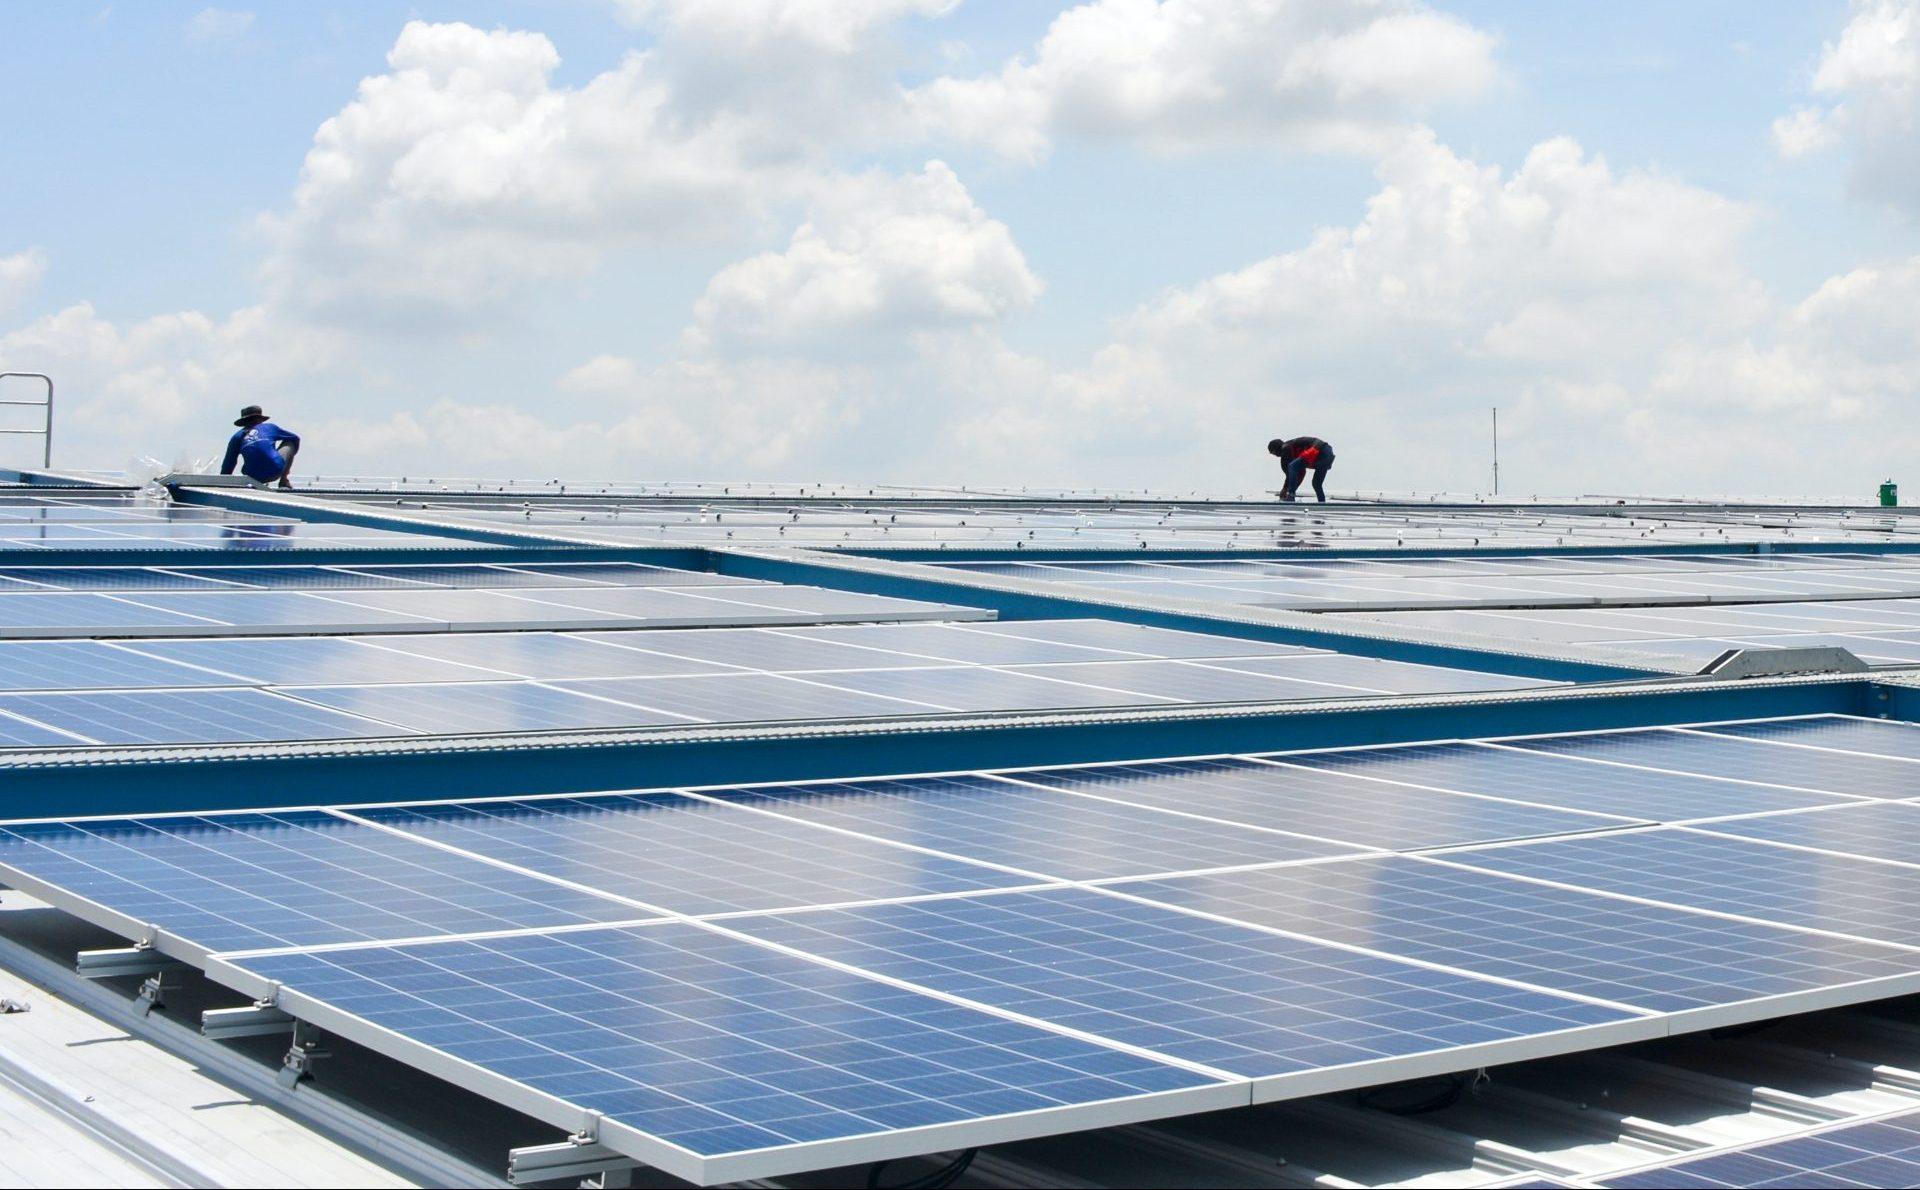 fotovoltaico tetti